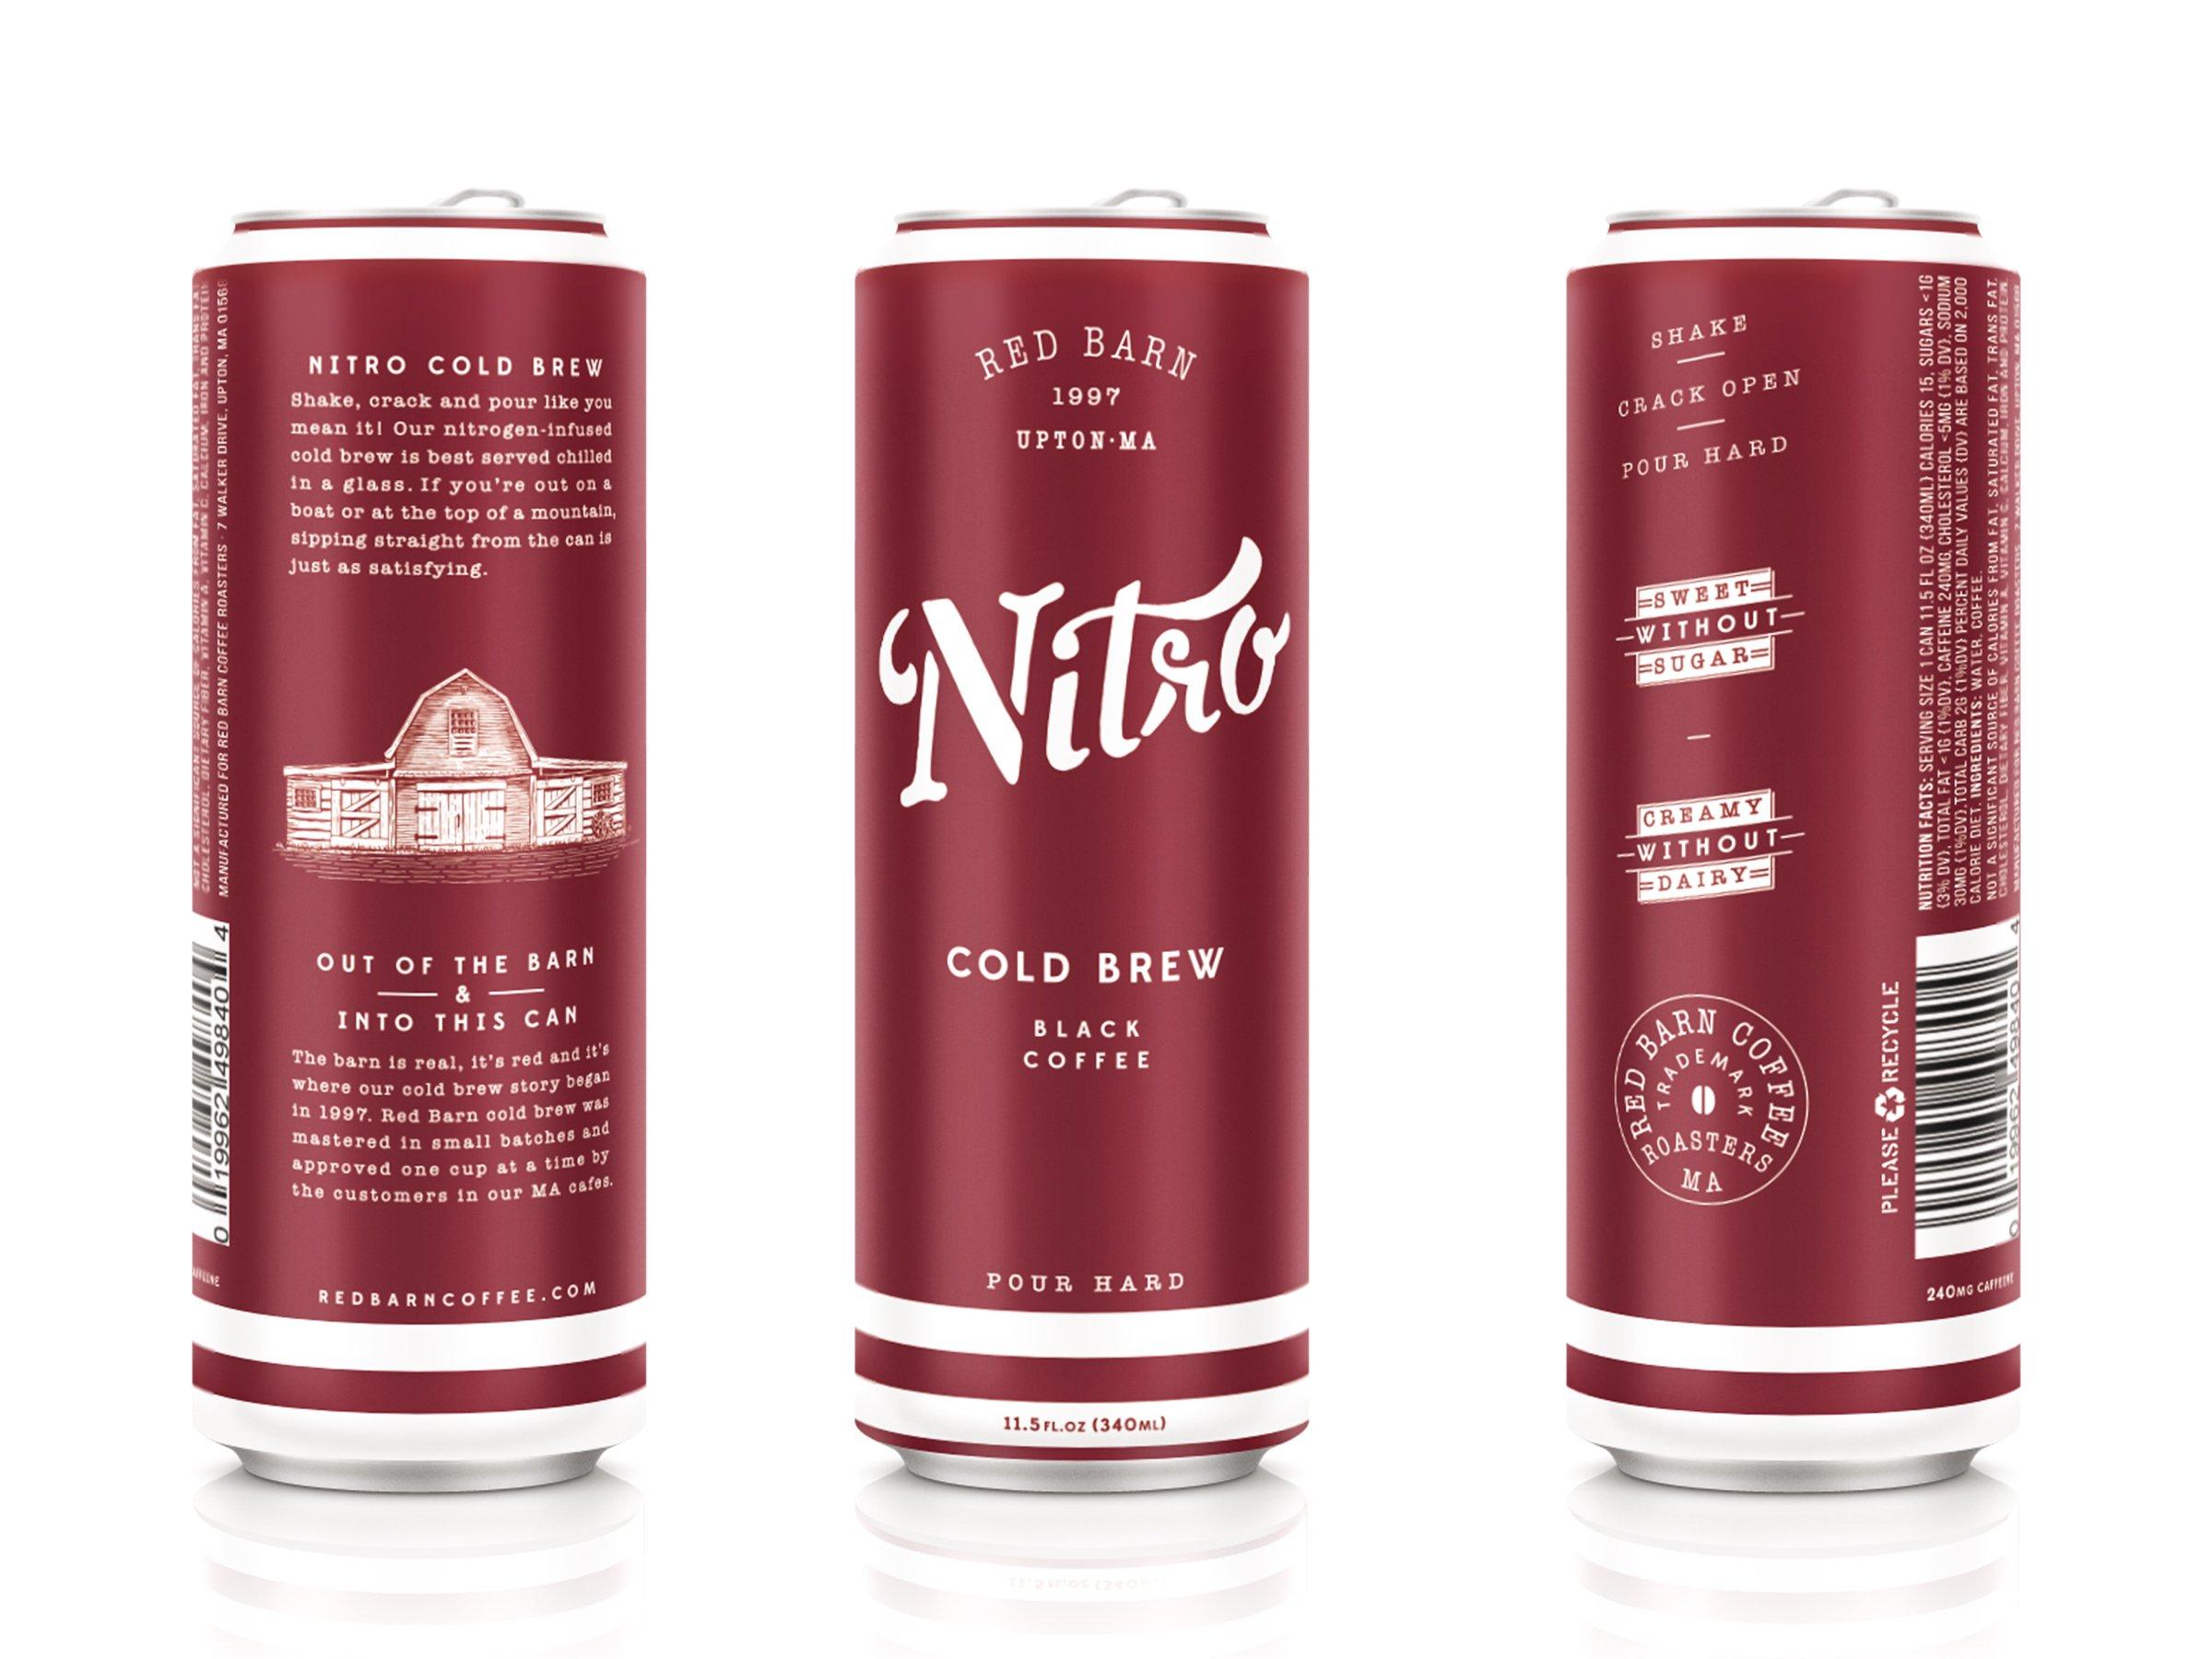 Nitro Cold Brew Coffee (12 11.5 fl. oz. cans)   Red Barn Coffee Roasters   Shelf Stable – No Preservatives   3 Ingredients – Coffee, Water, Nitrogen   240 MG Caffeine